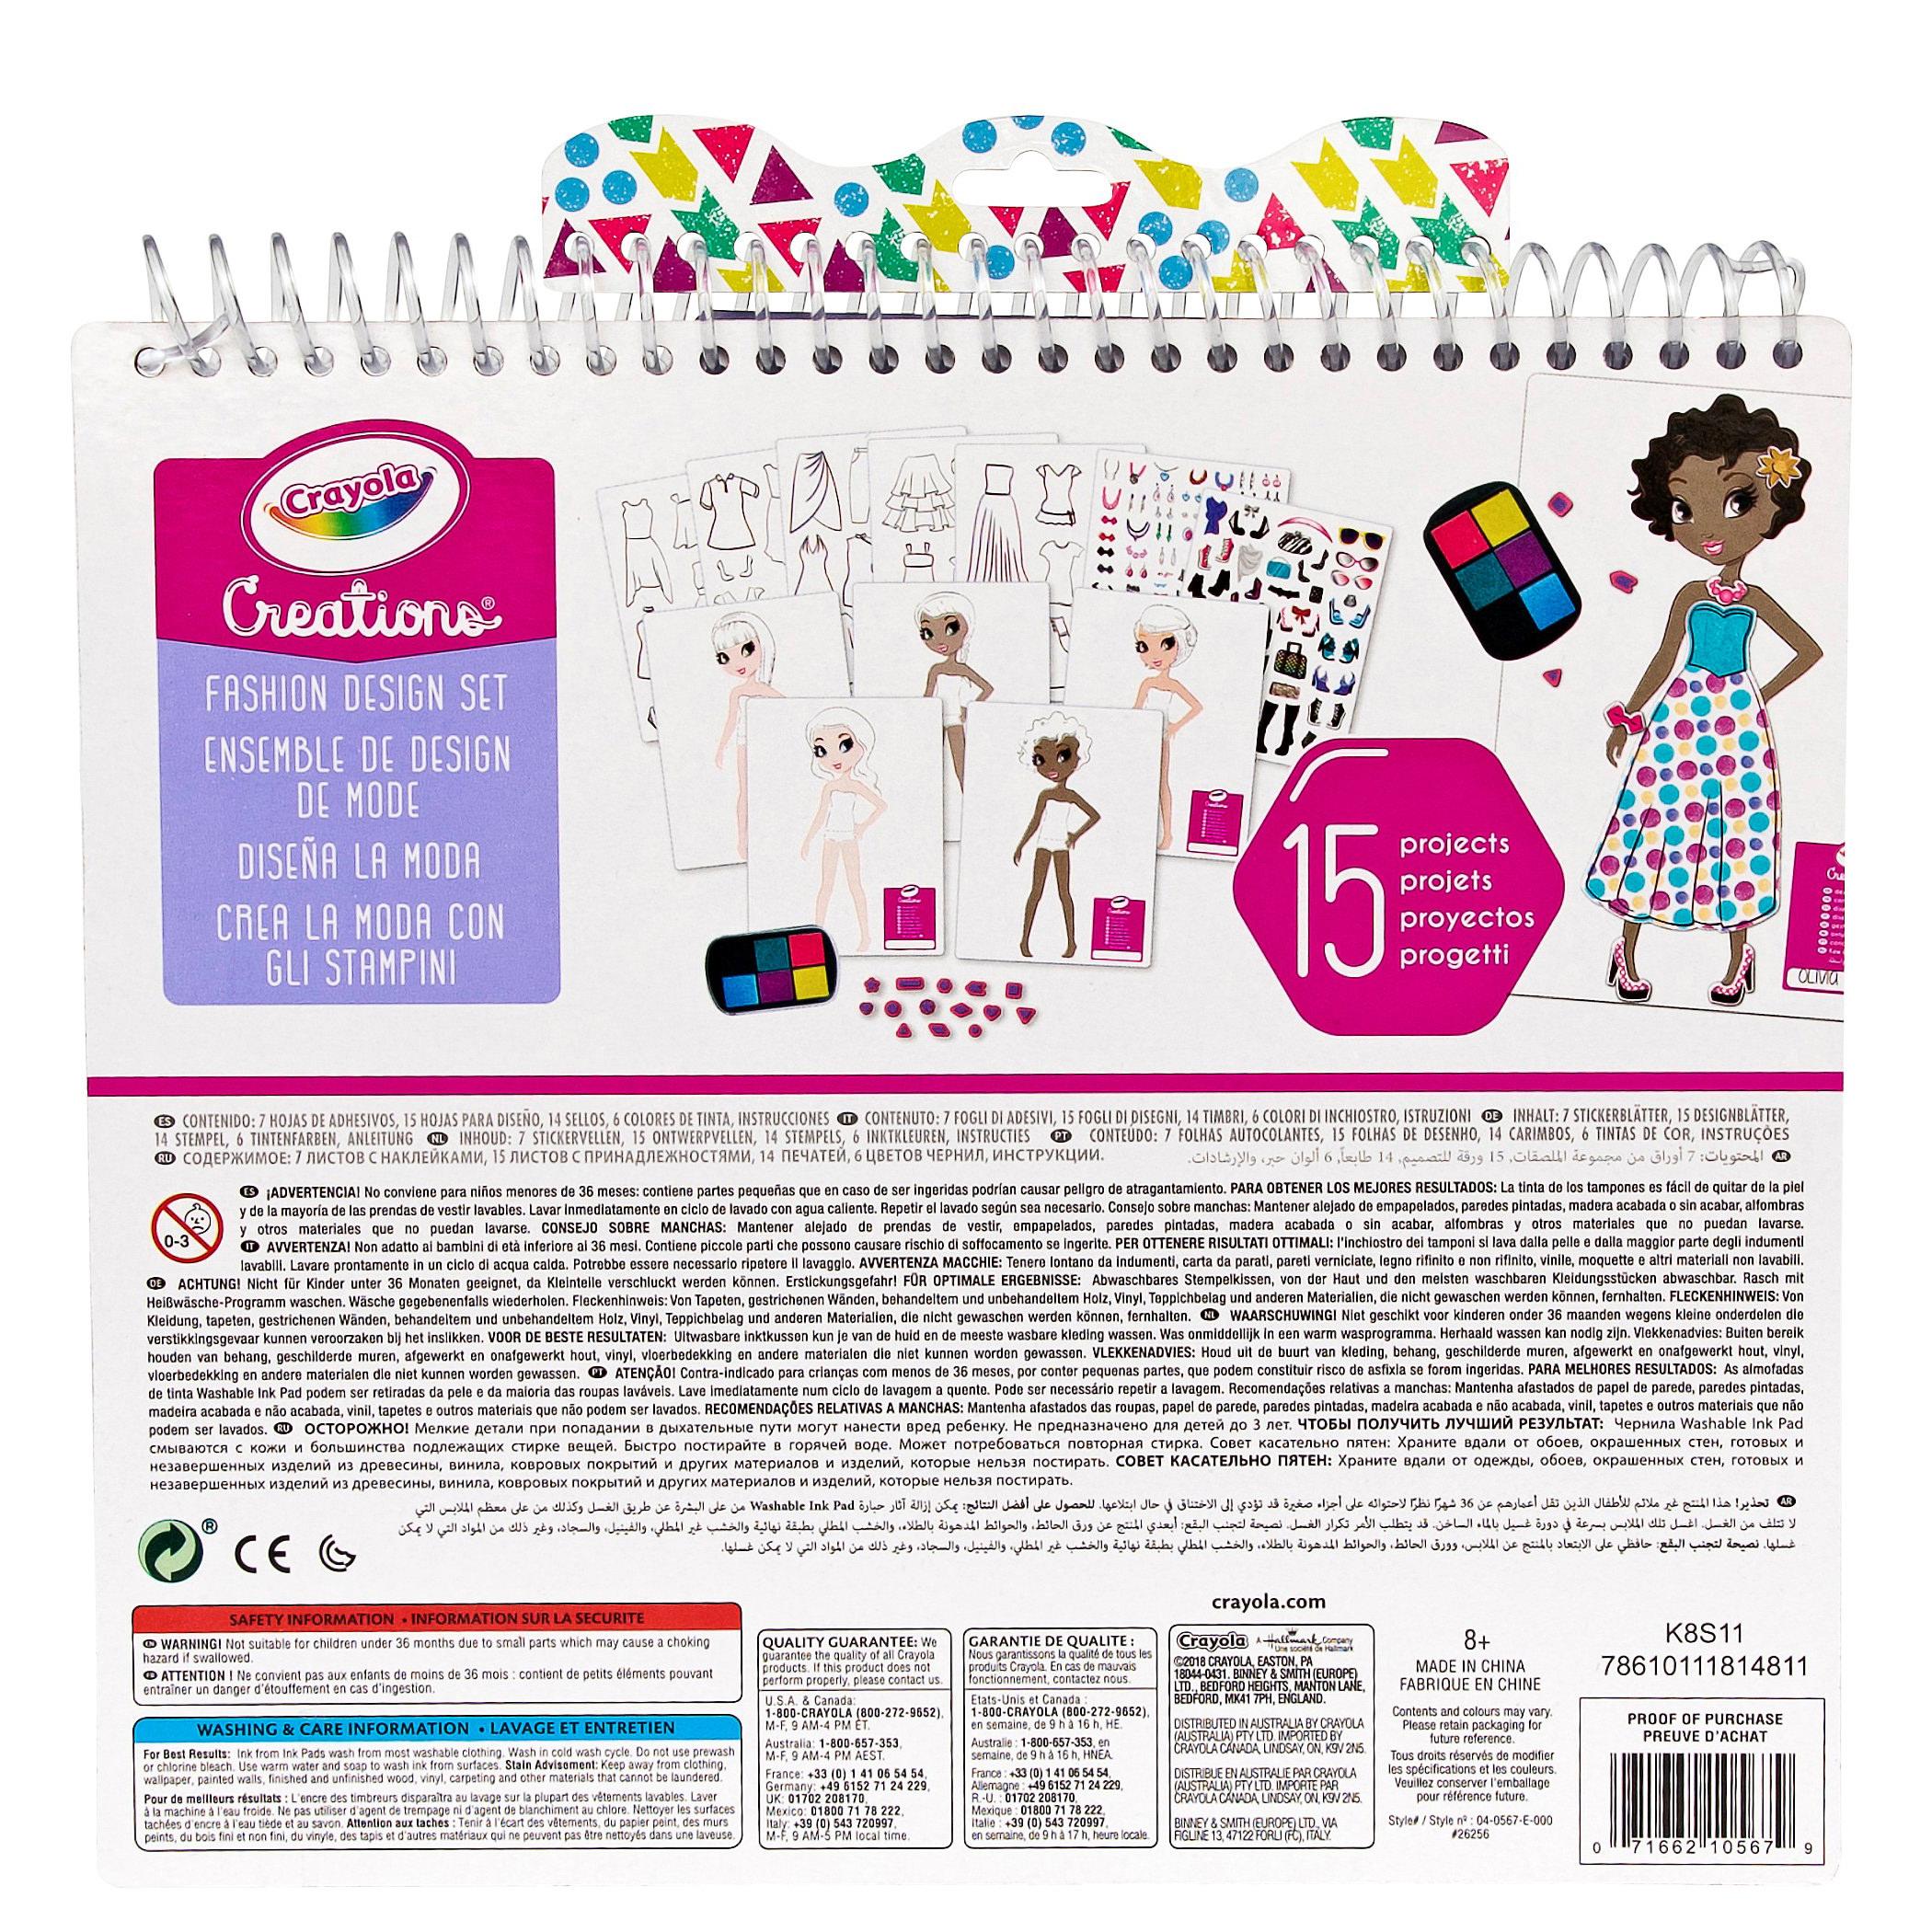 Crayola Creations Fashion Design Set At Toys R Us